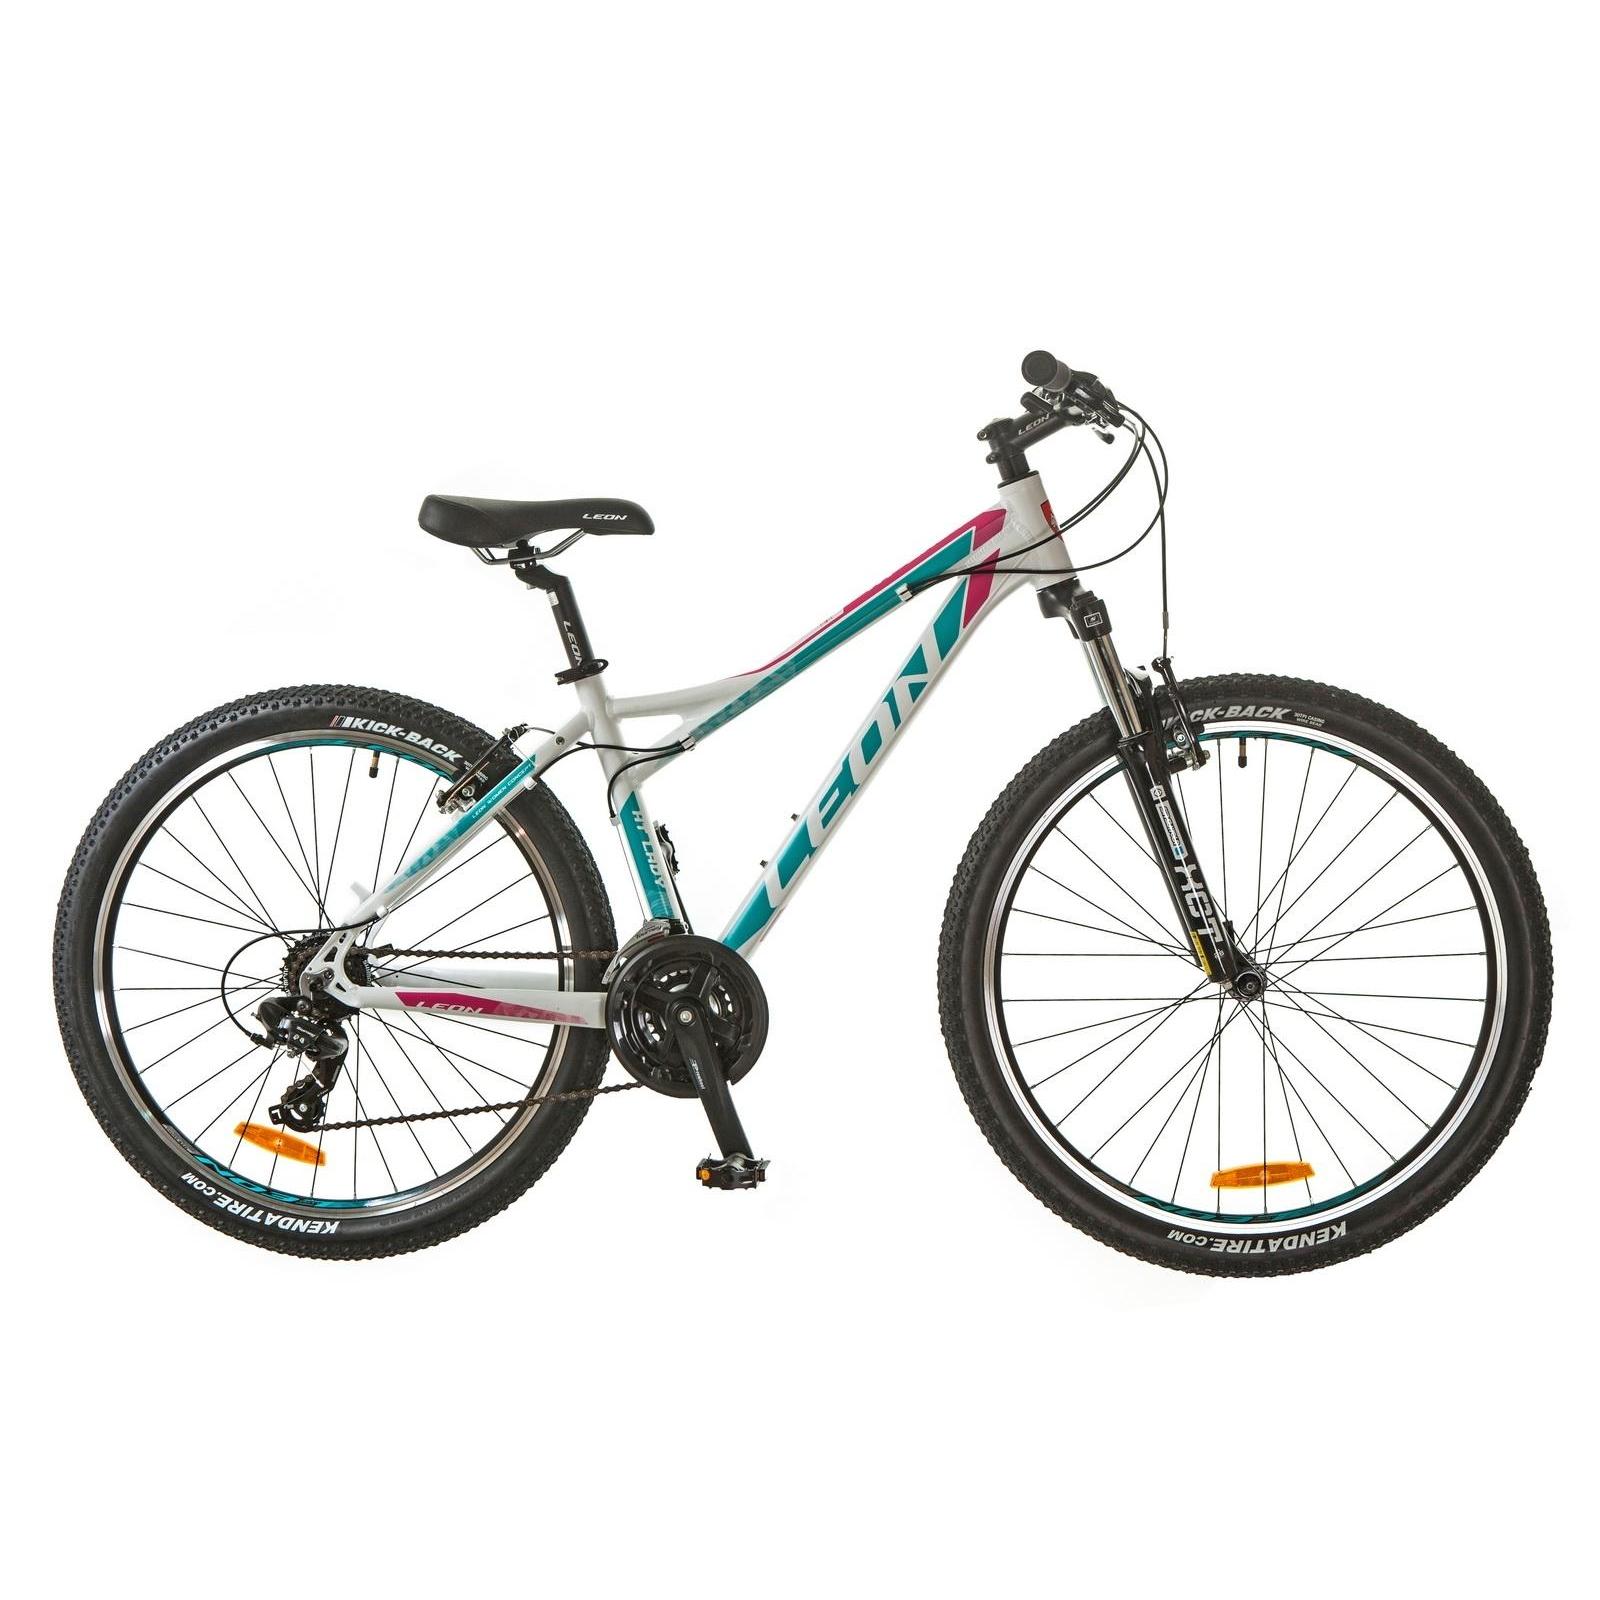 "Велосипед Leon 26"" HT-LADY 2018 AM 14G Vbr рама-18"" Al аквамарин (OPS-LN-26-035)"